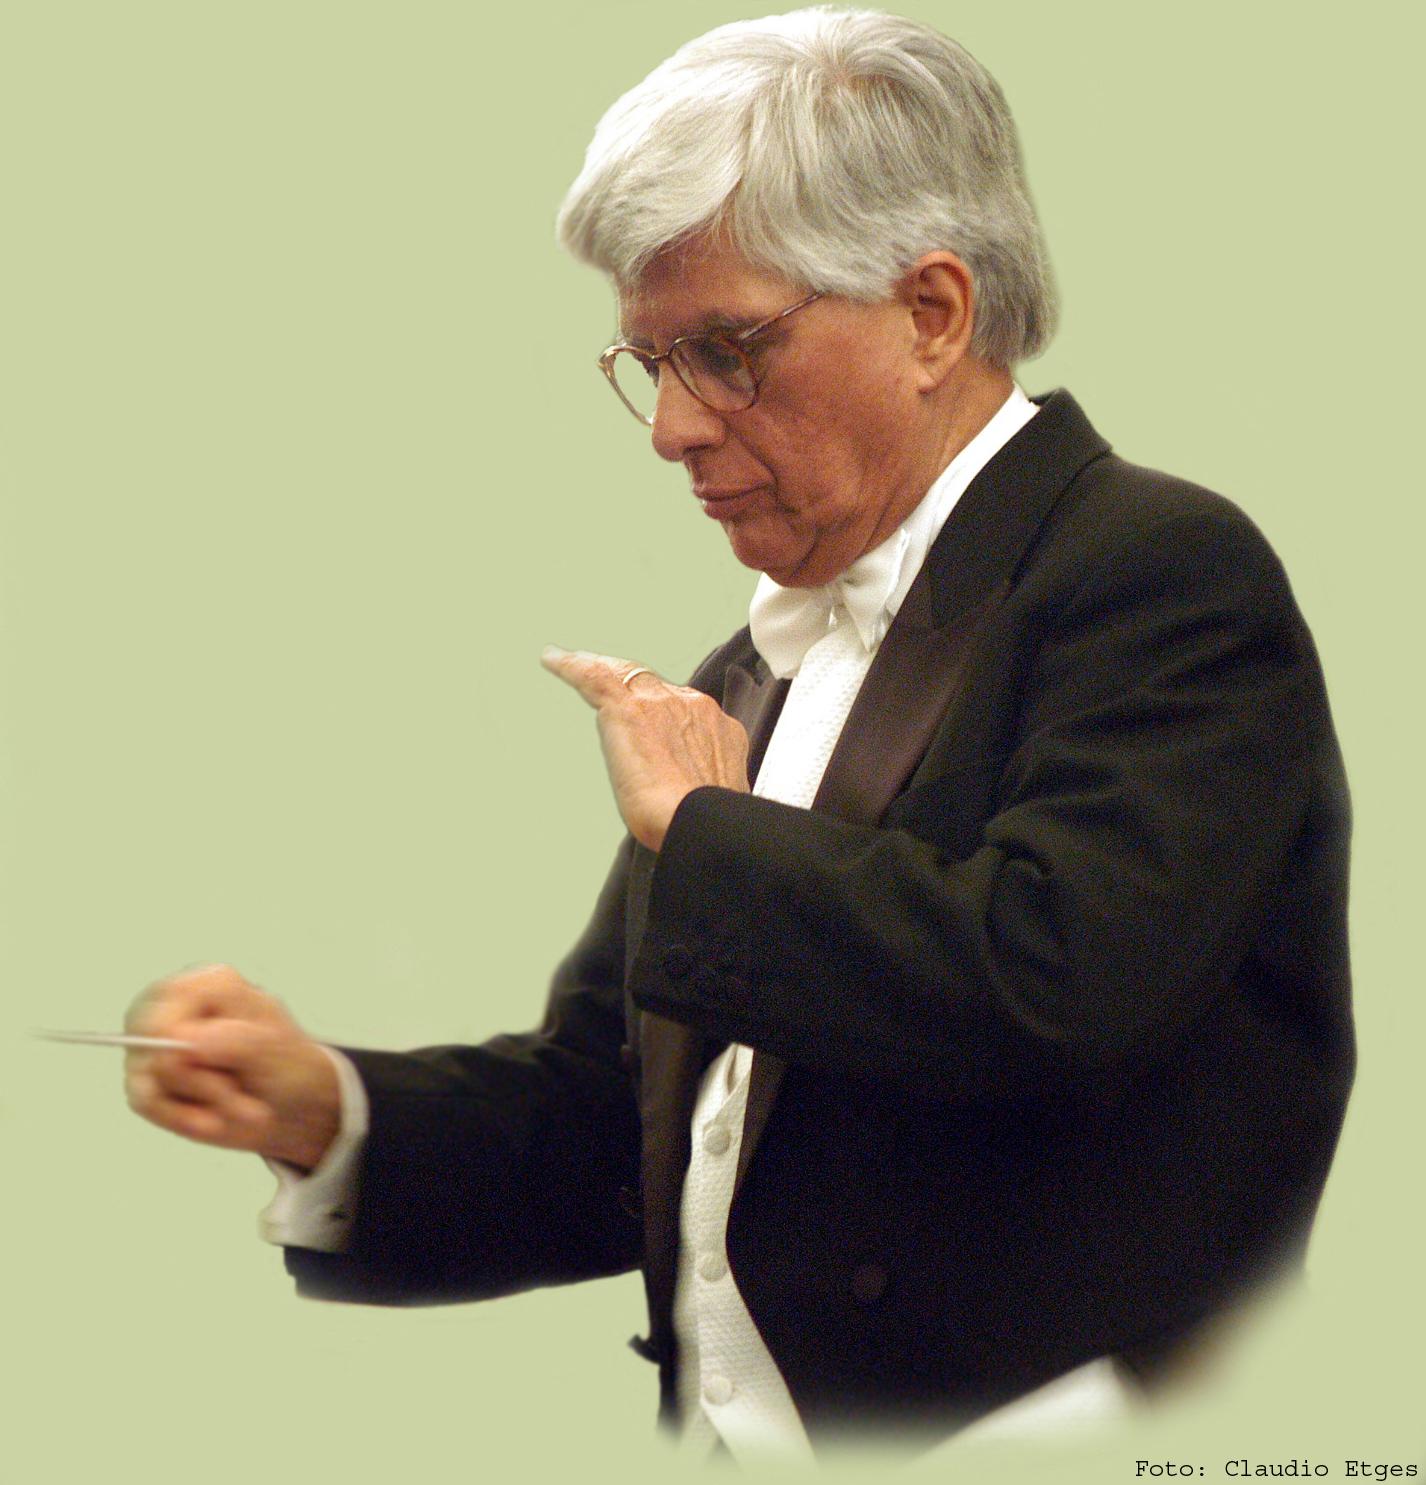 Roberto Duarte casaca.jpg